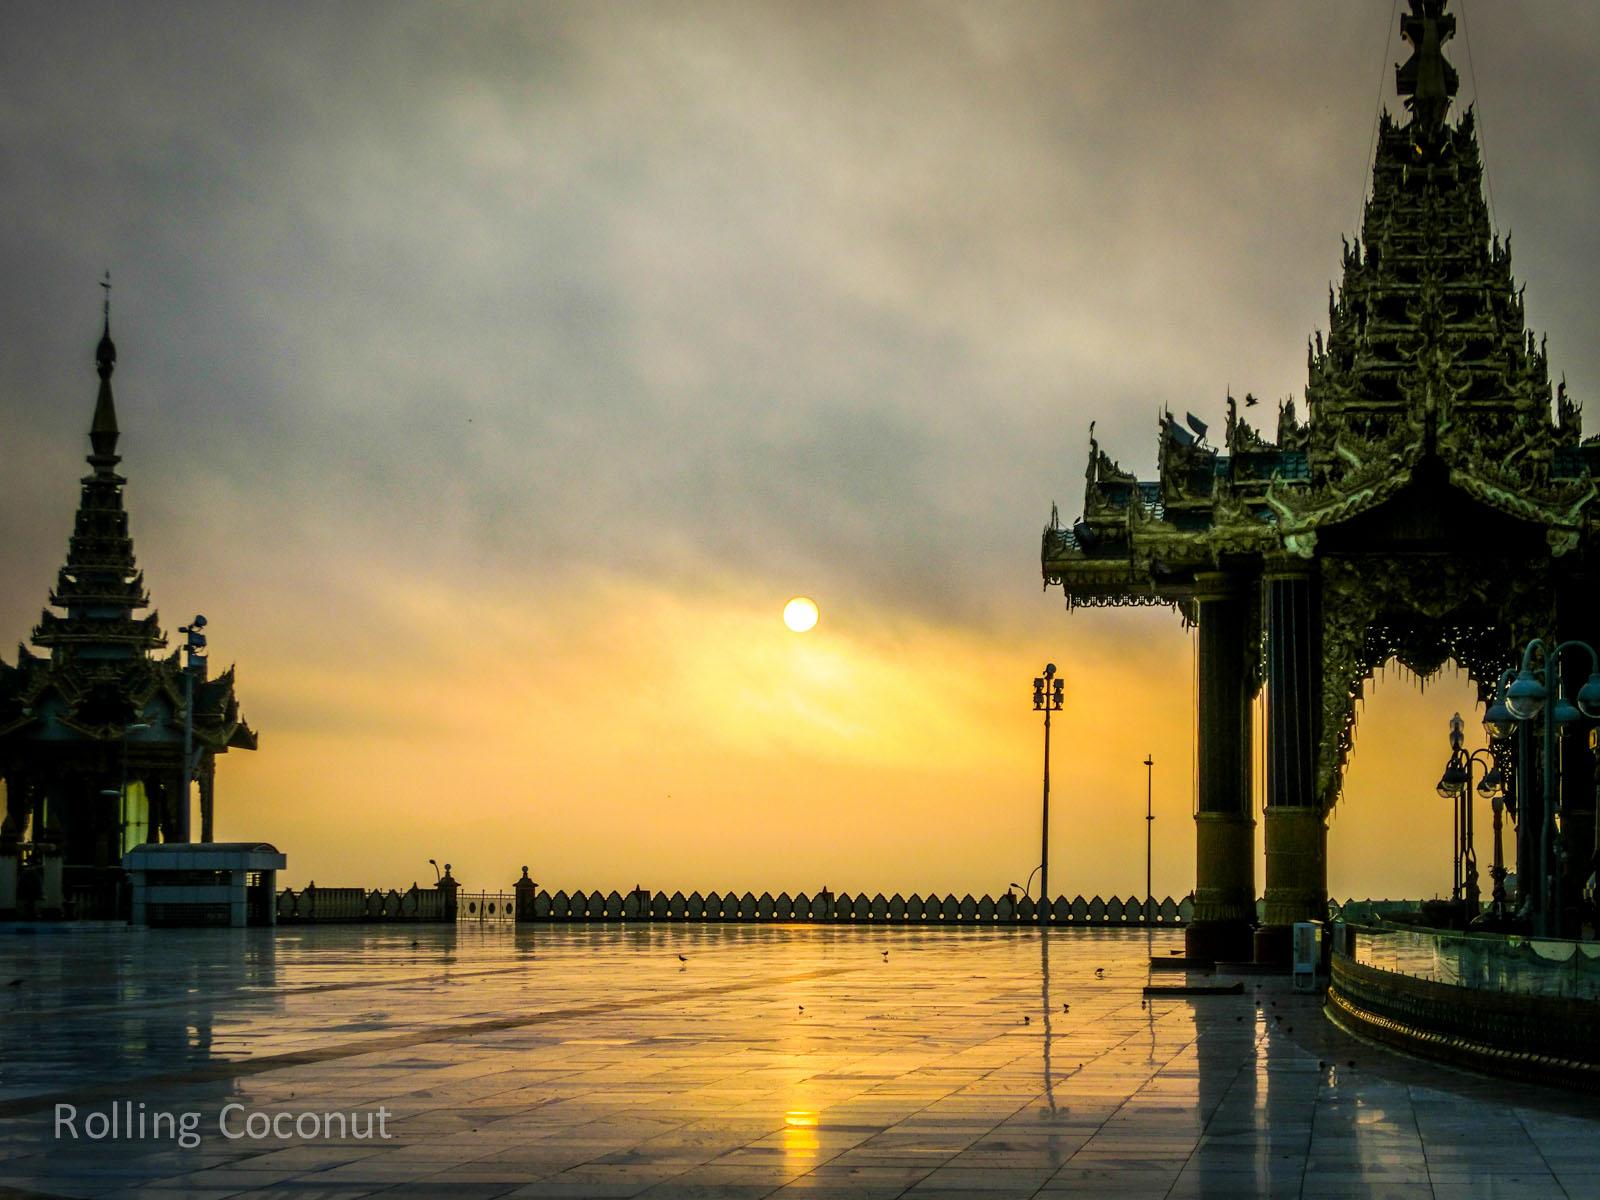 Myanmar Itinerary Uppatasanti Pagoda Sunrise Rolling Coconut Ooaworld Photo Ooaworld